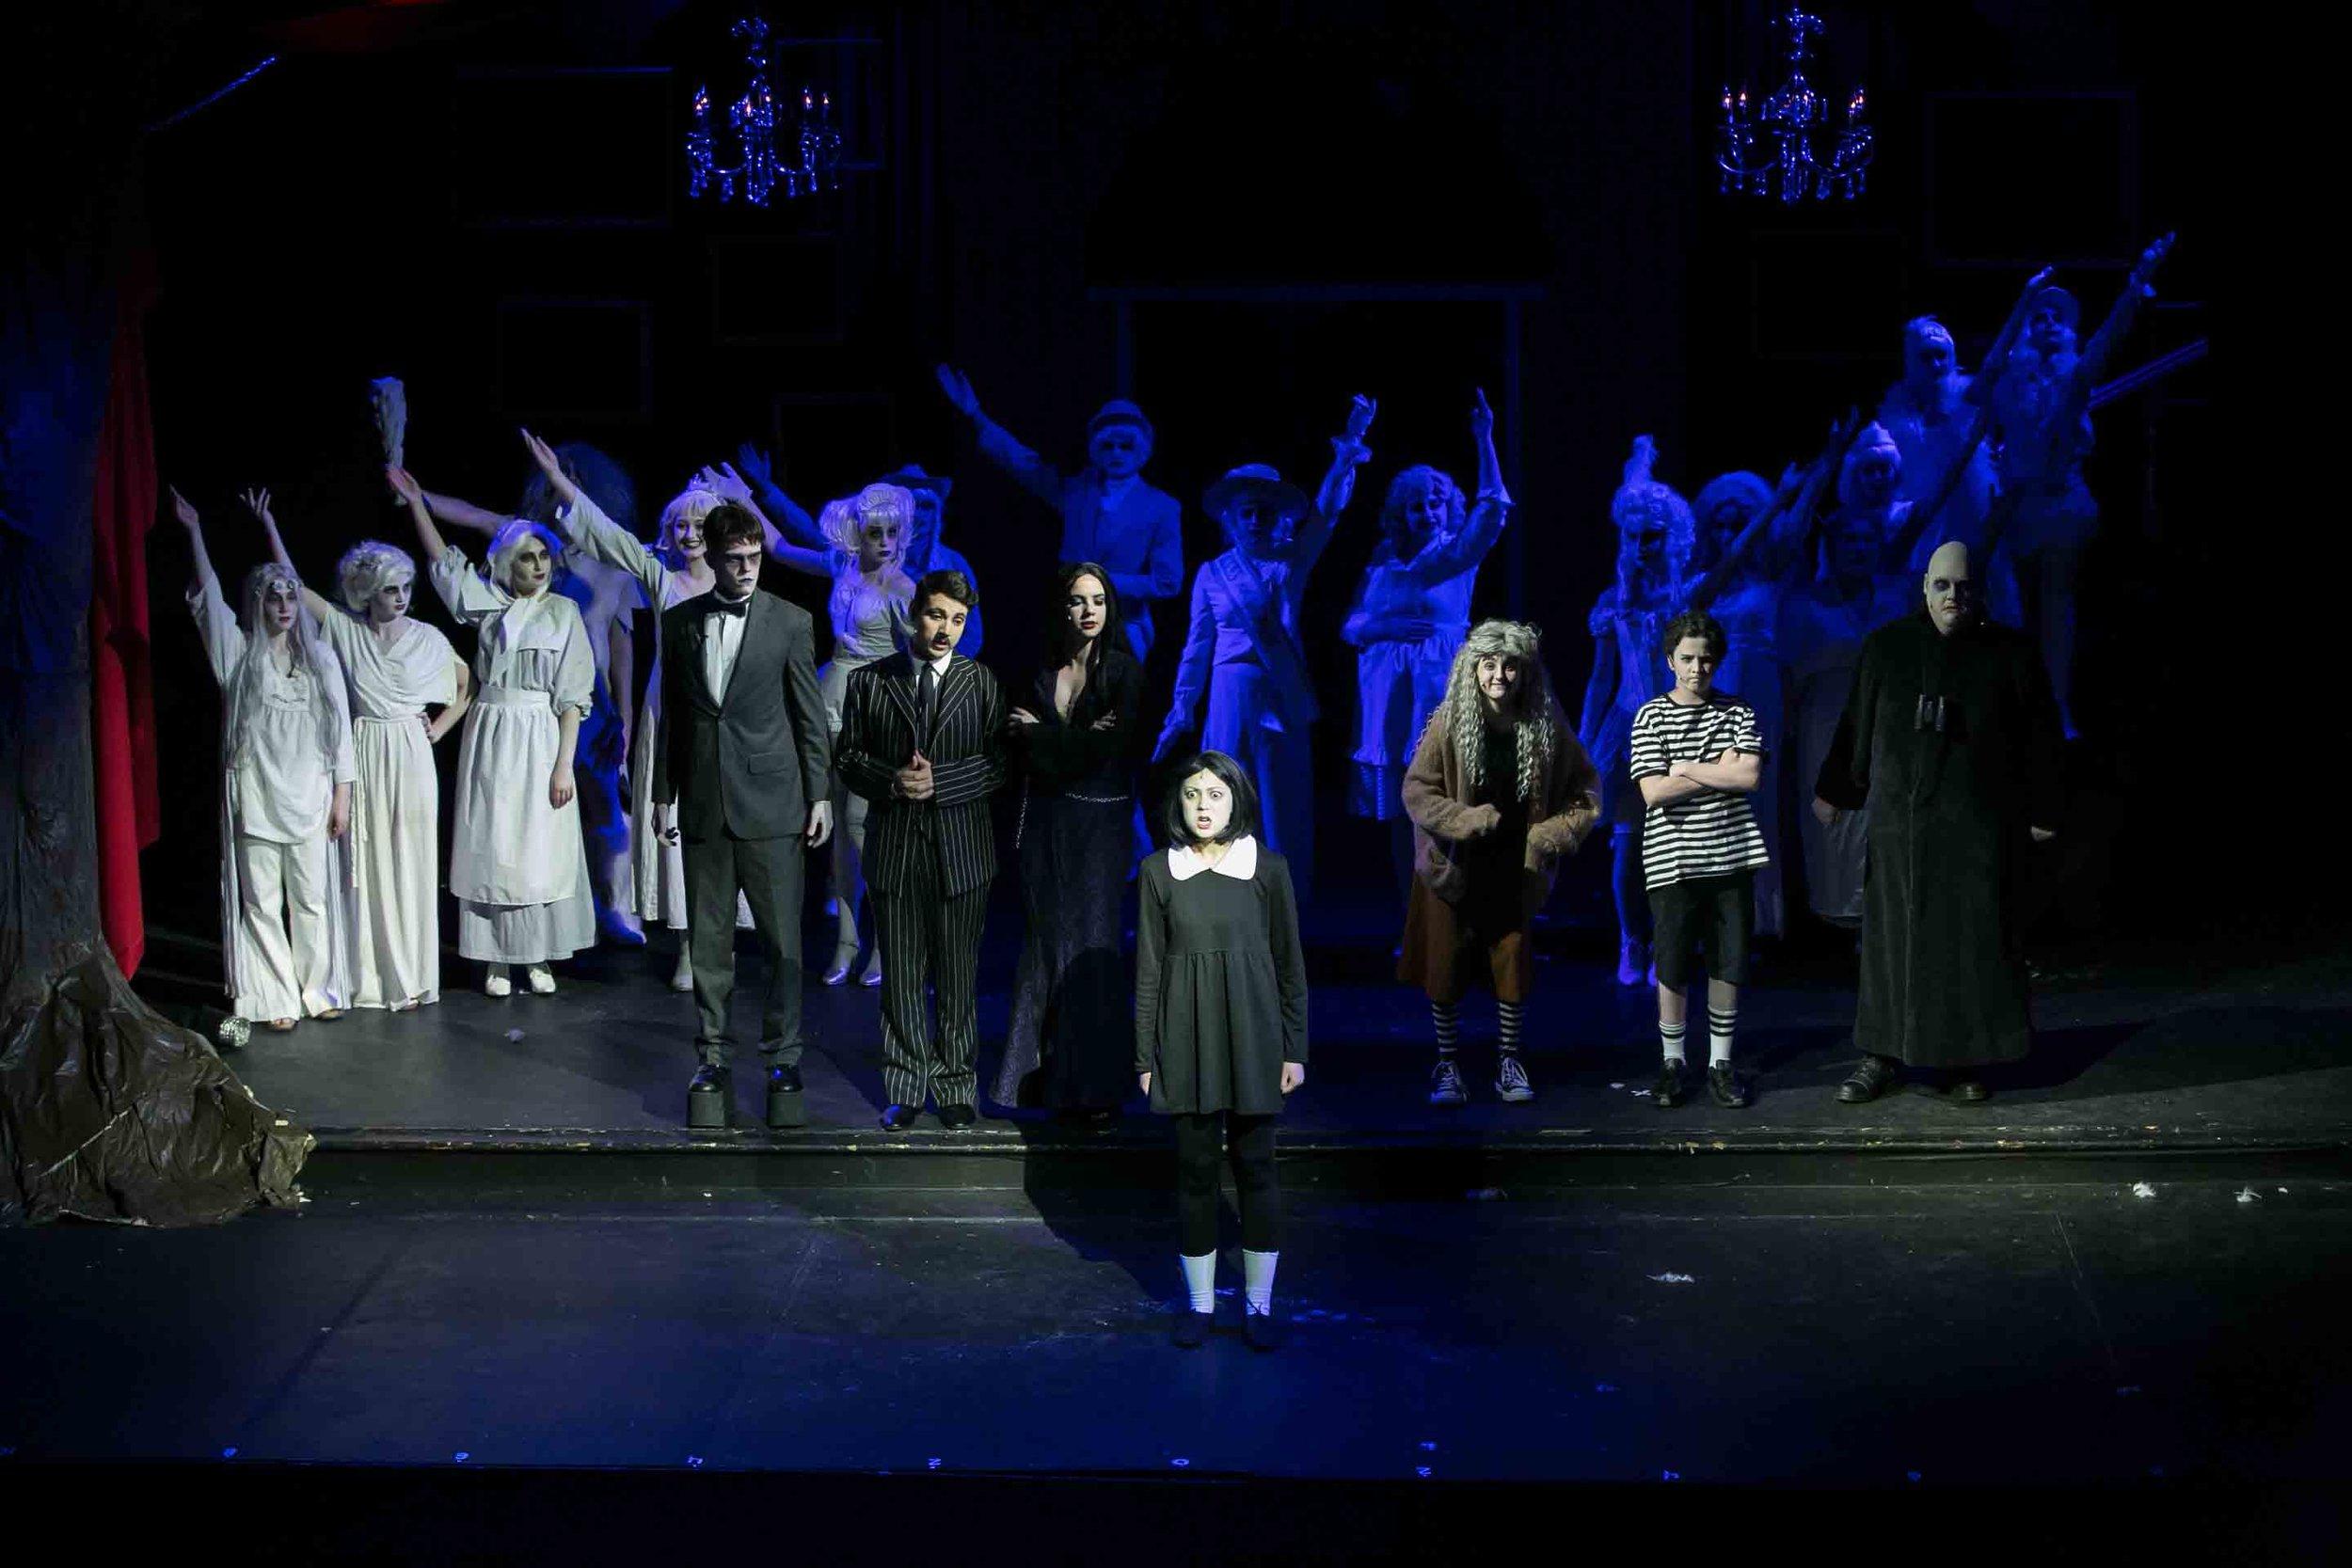 6-19-16 Addams Family Creepy Cast 0106.jpg